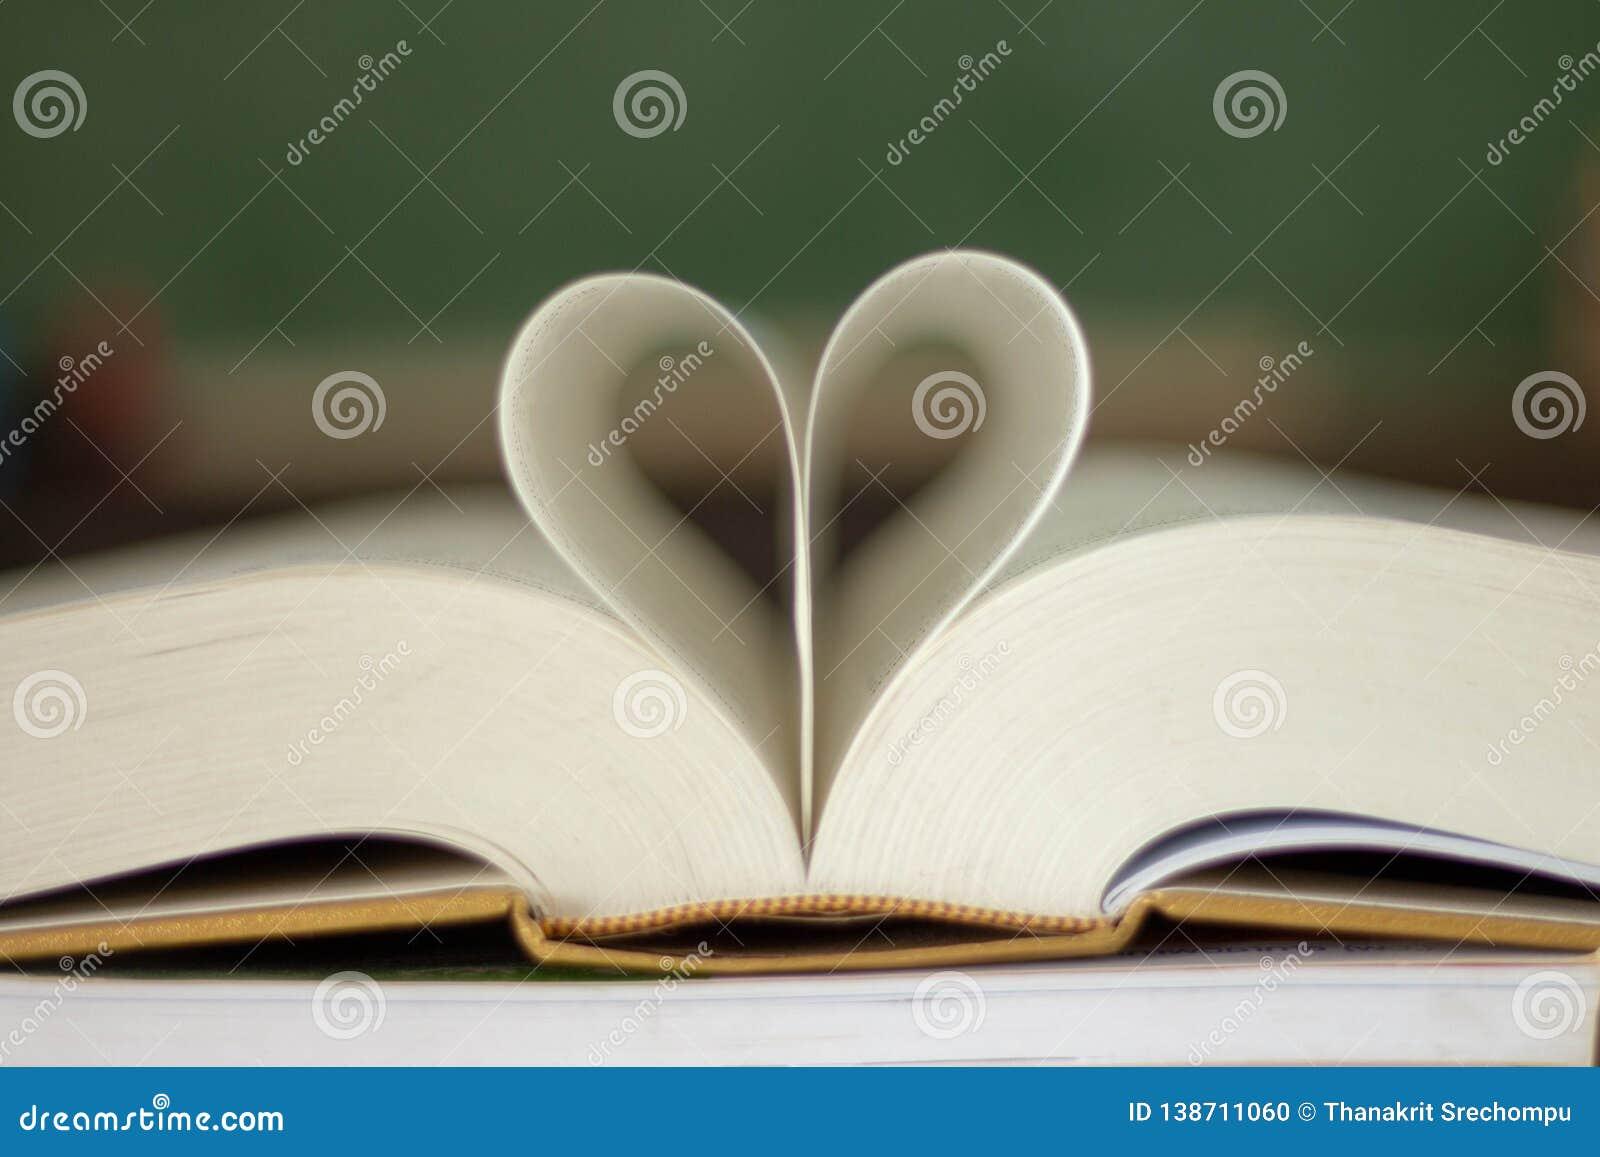 .Closed heart shape